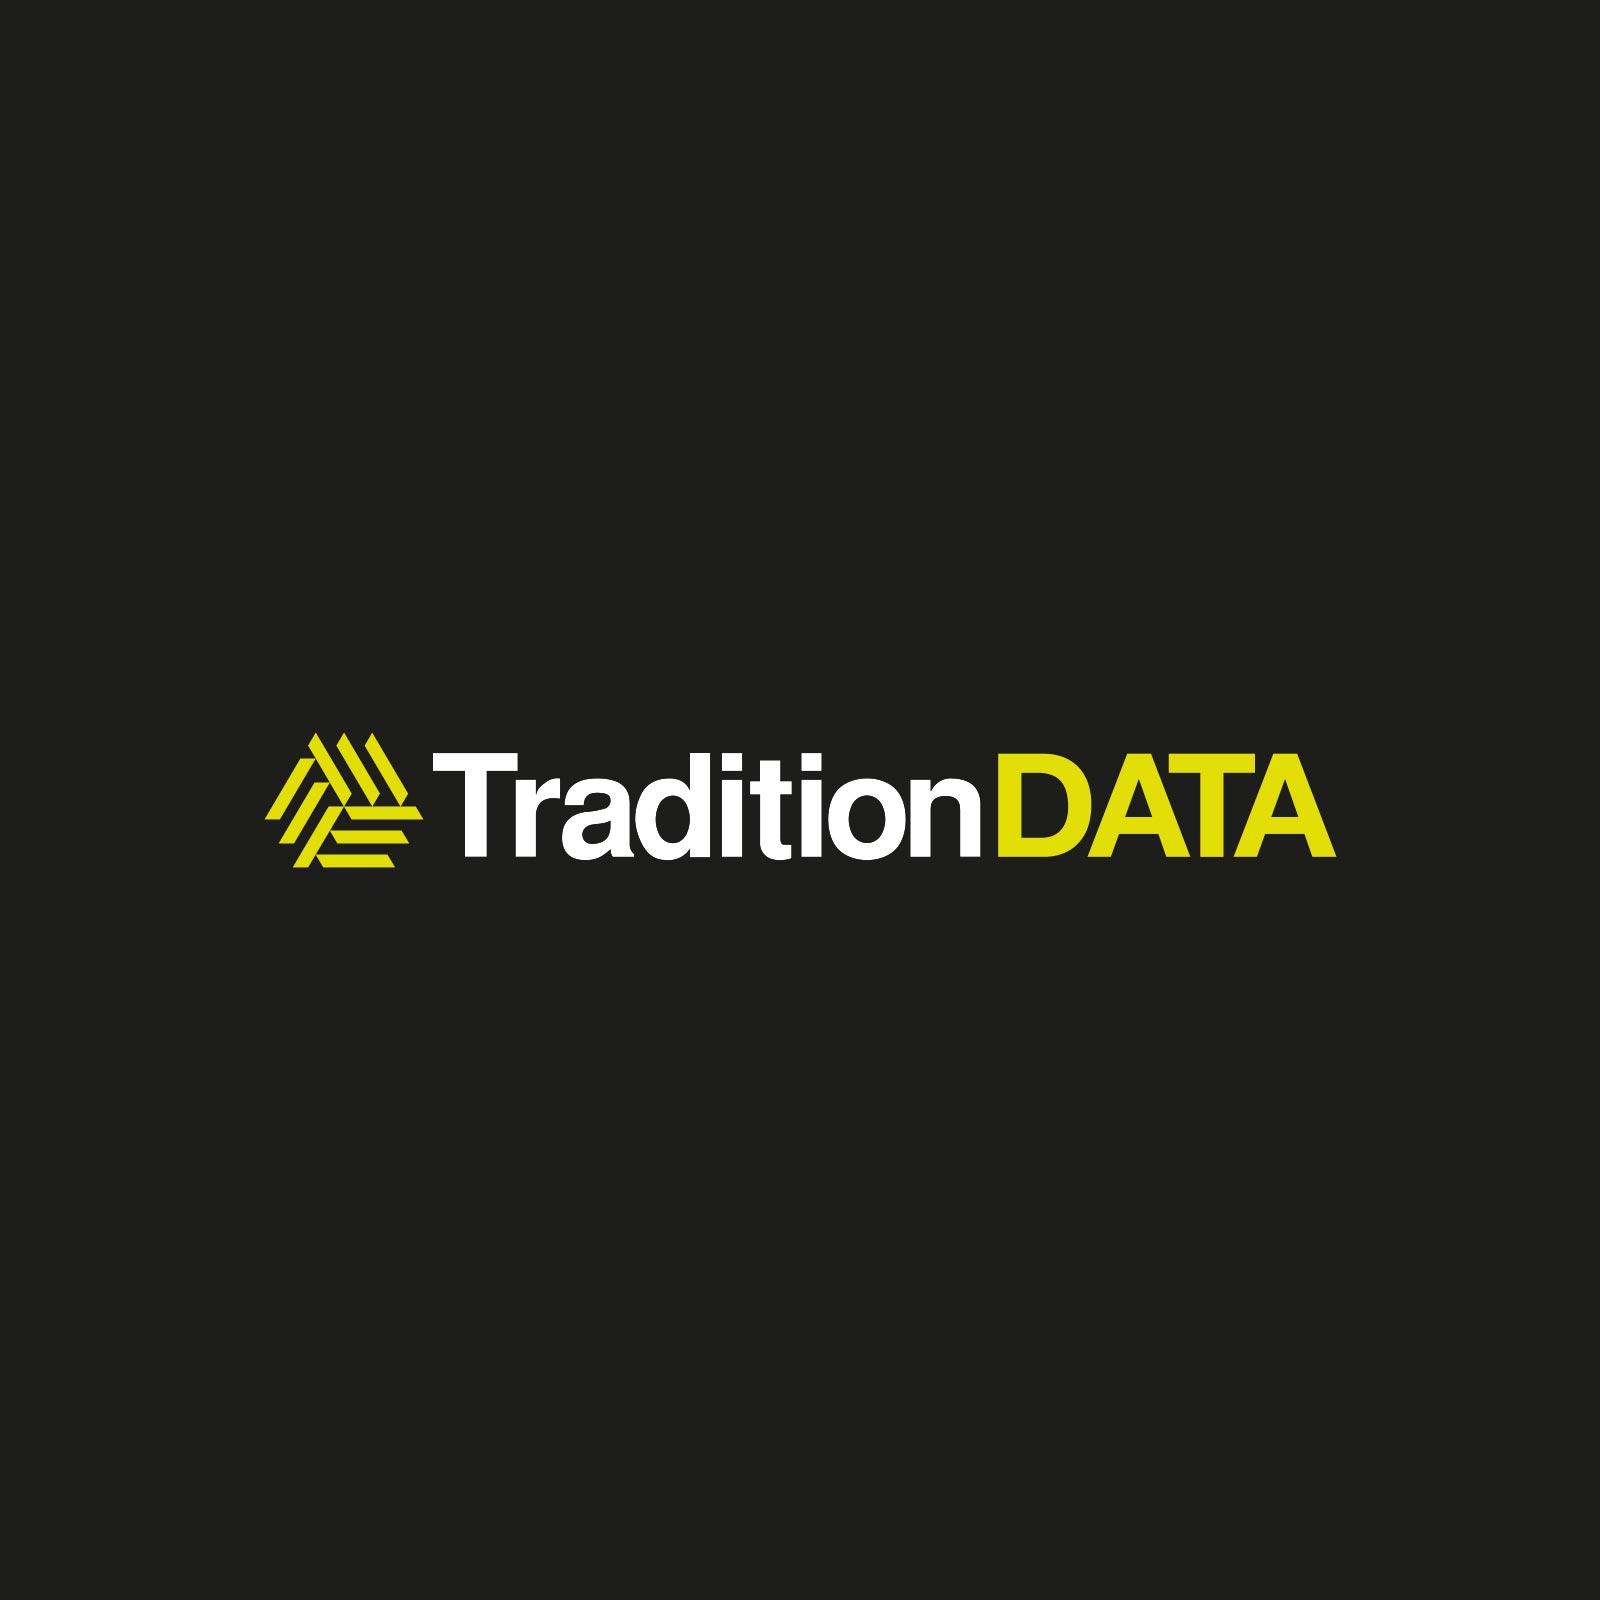 Tradition-data_LOGO.jpg